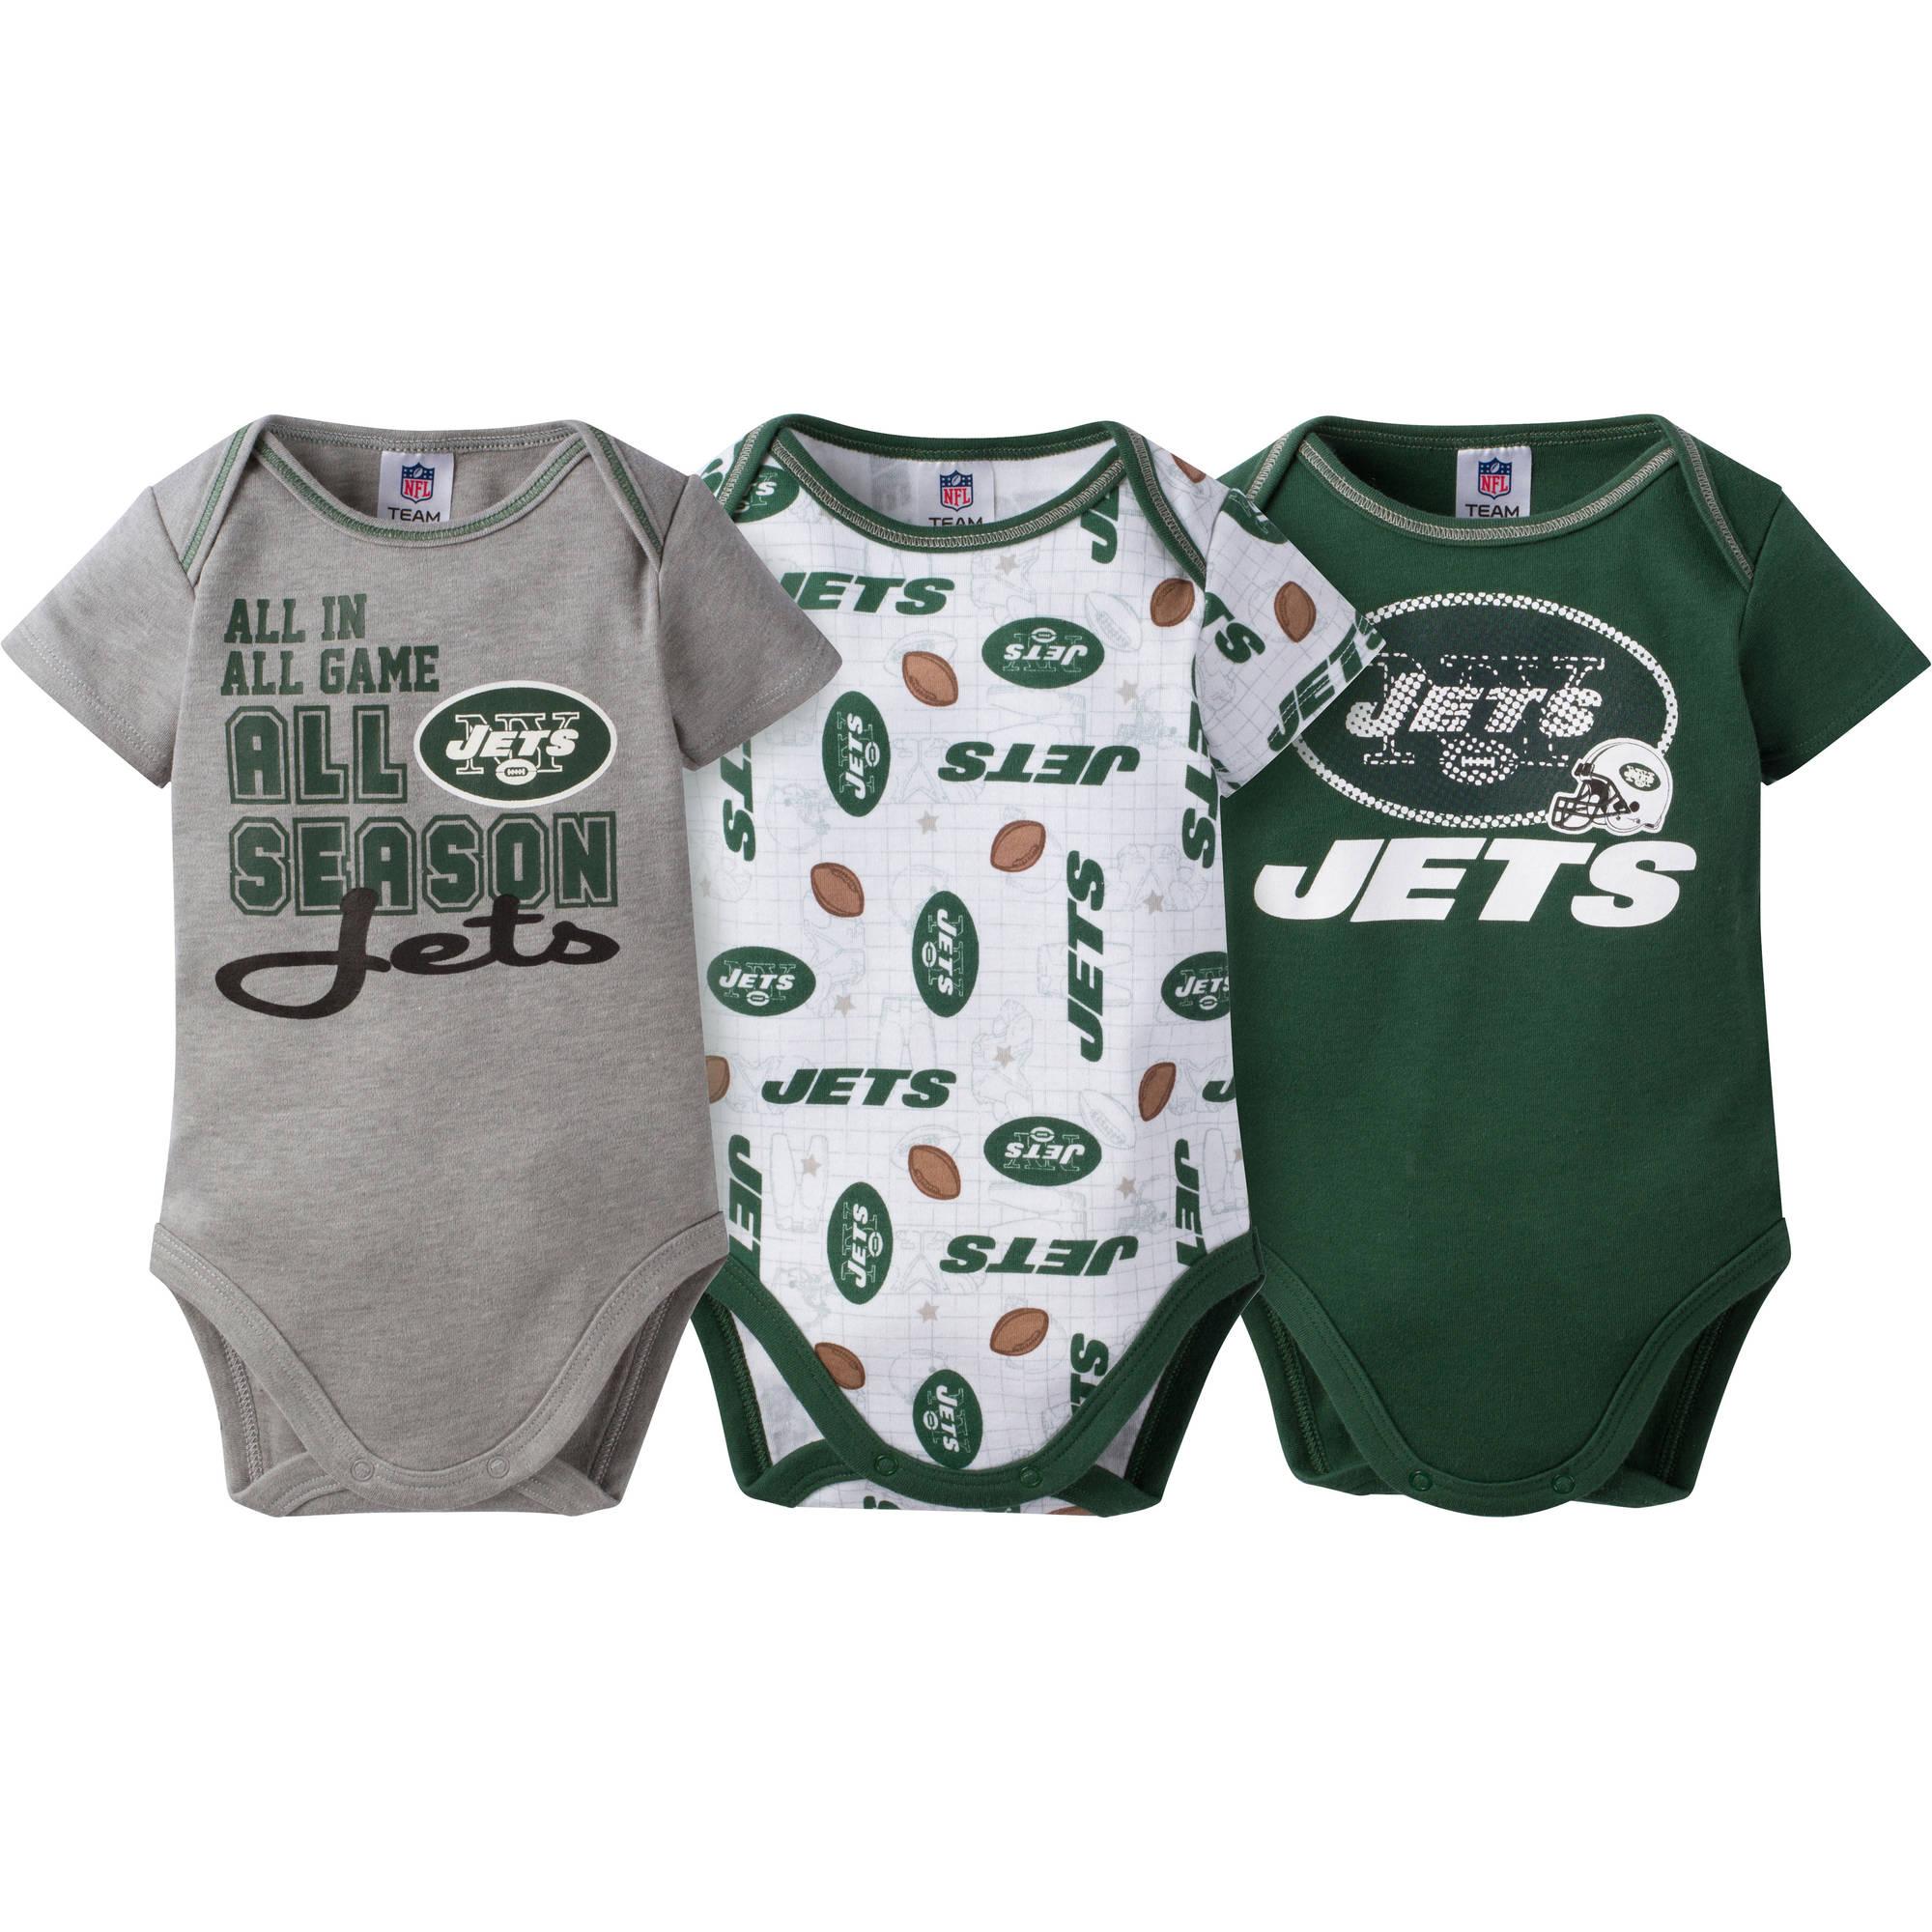 NFL New York Jets Baby Boys Short Sleeve Bodysuit Set, 3-Pack